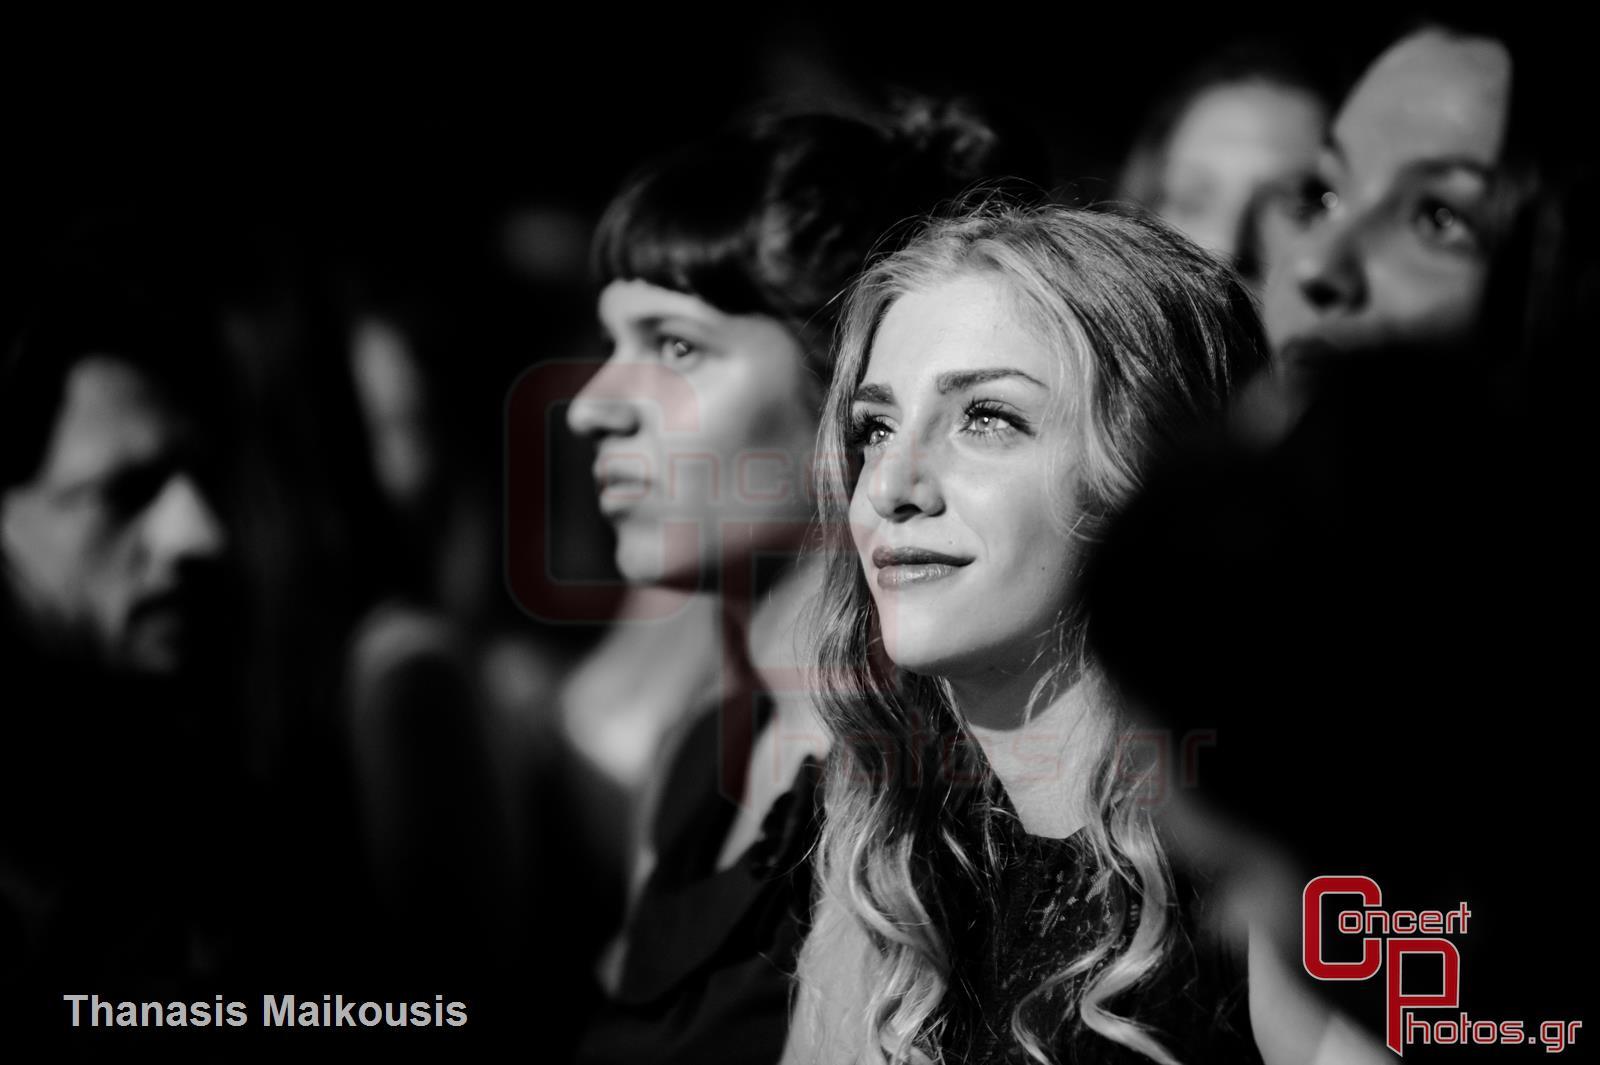 Gramatik-Gramatik Votanikos 2013 photographer: Thanasis Maikousis - ConcertPhotos-5751